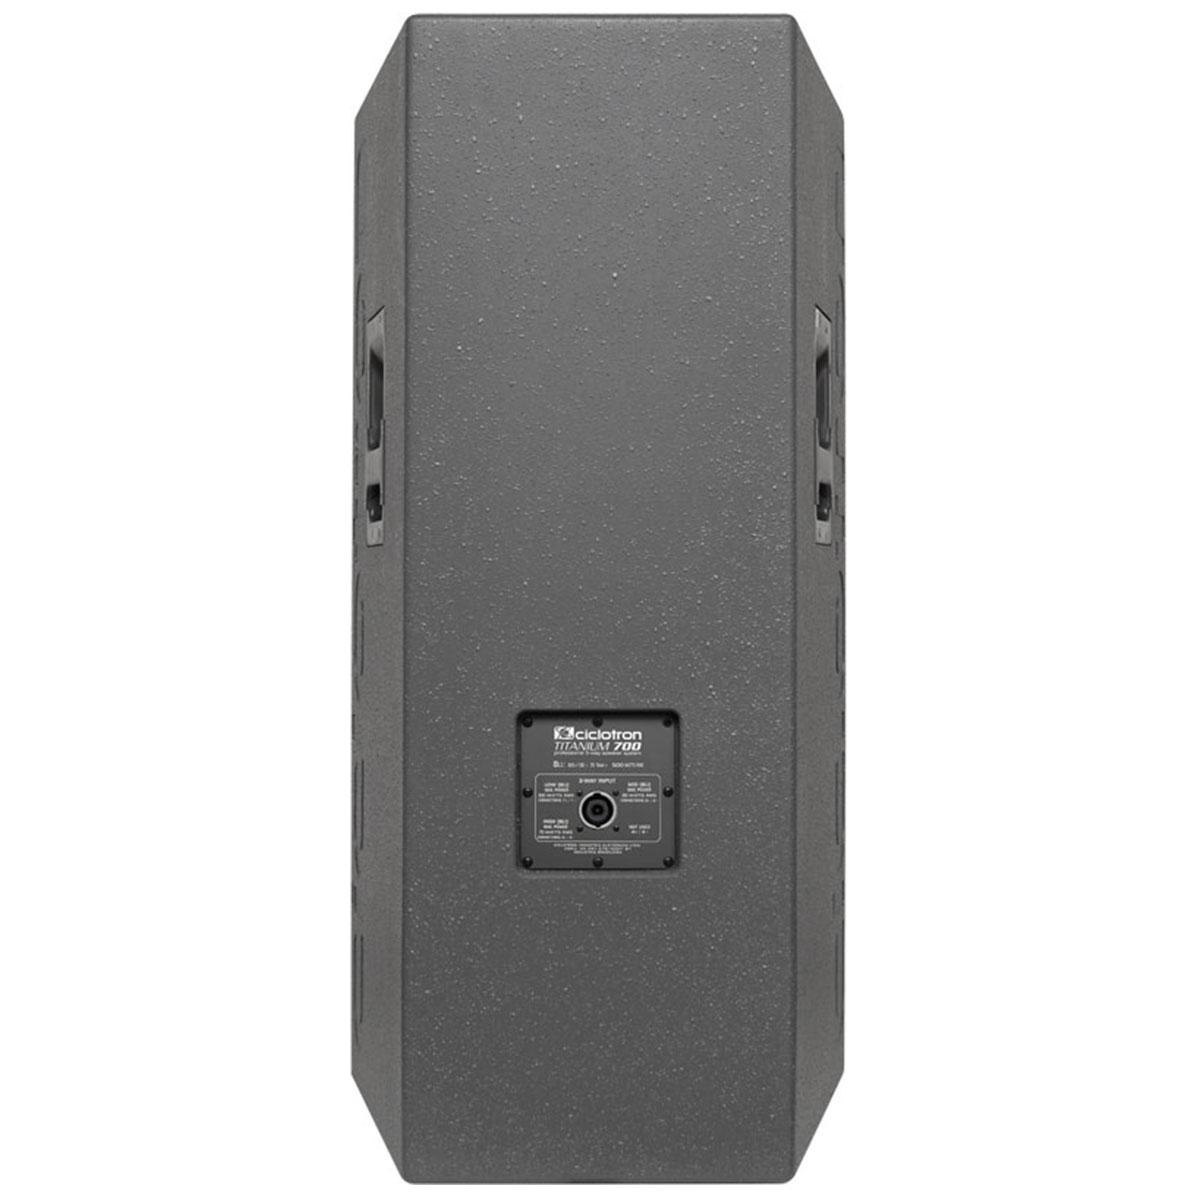 Caixa Passiva Fal 15 Pol 500W - Titanium 700 Ciclotron